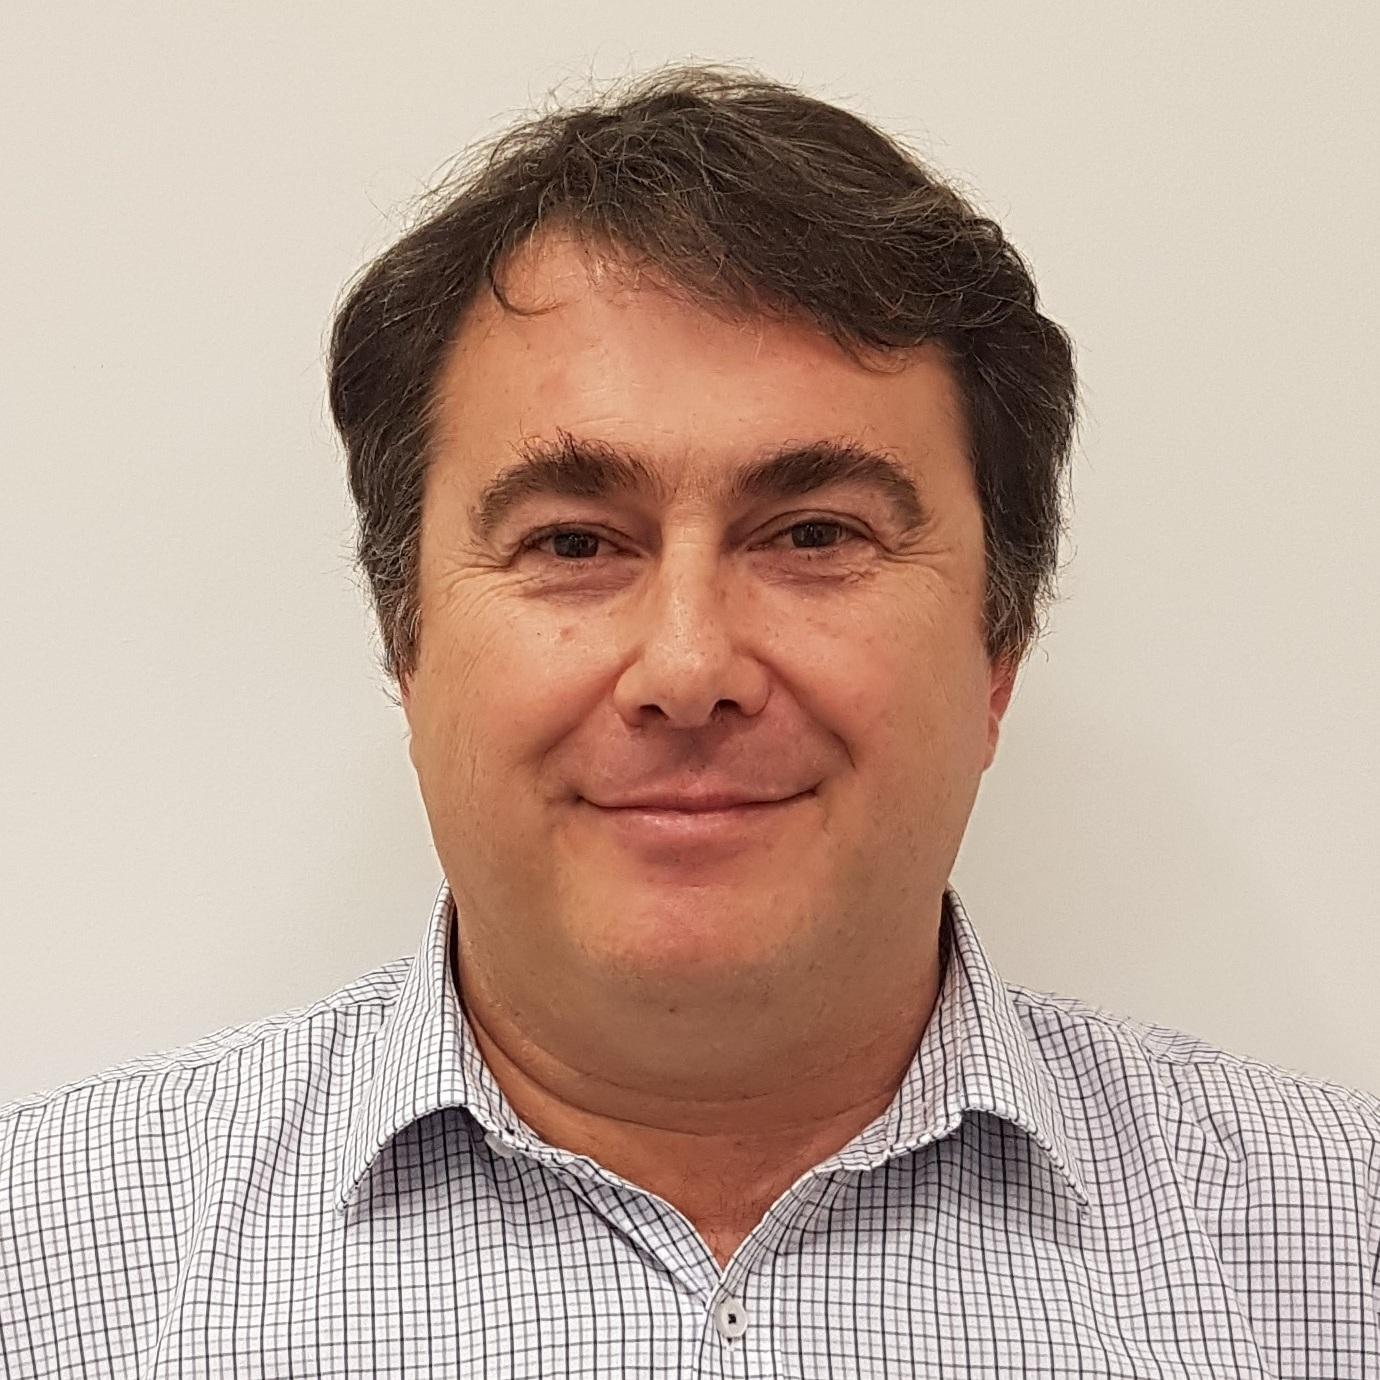 Daniel Floreani, Director CyberOps